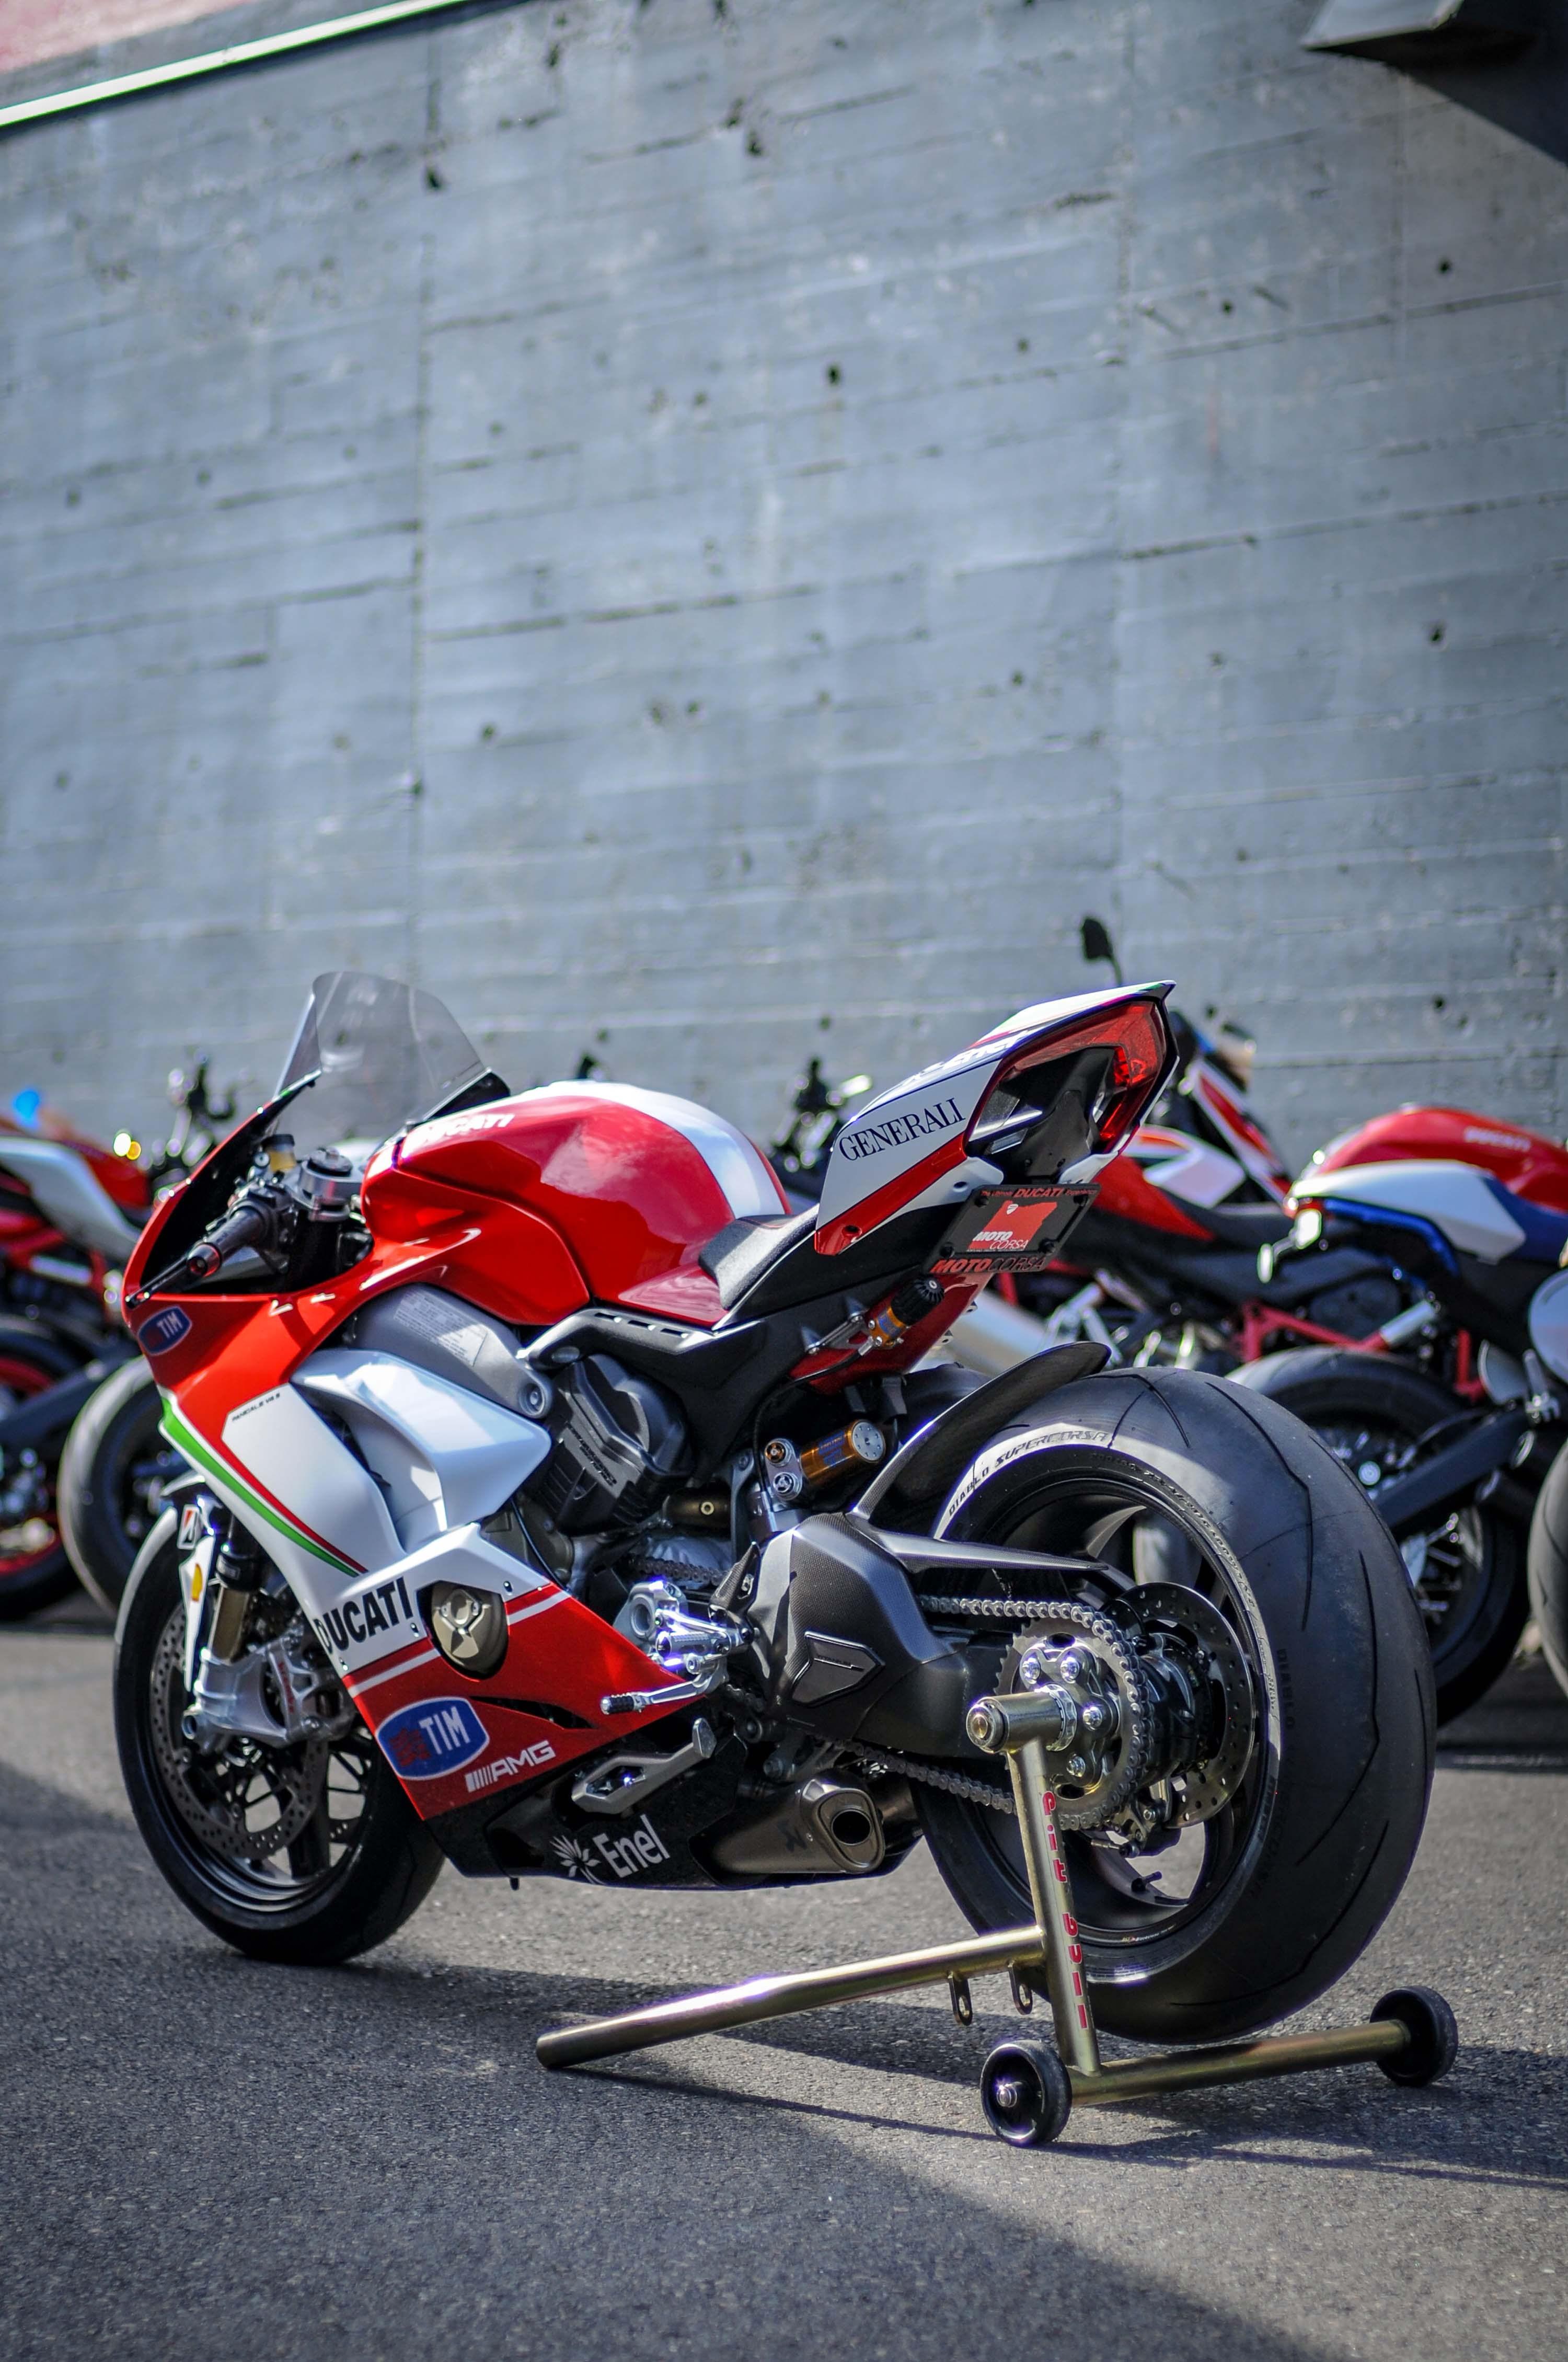 Nicky-Hayden-Ducati-Panigale-V4-tribute-32